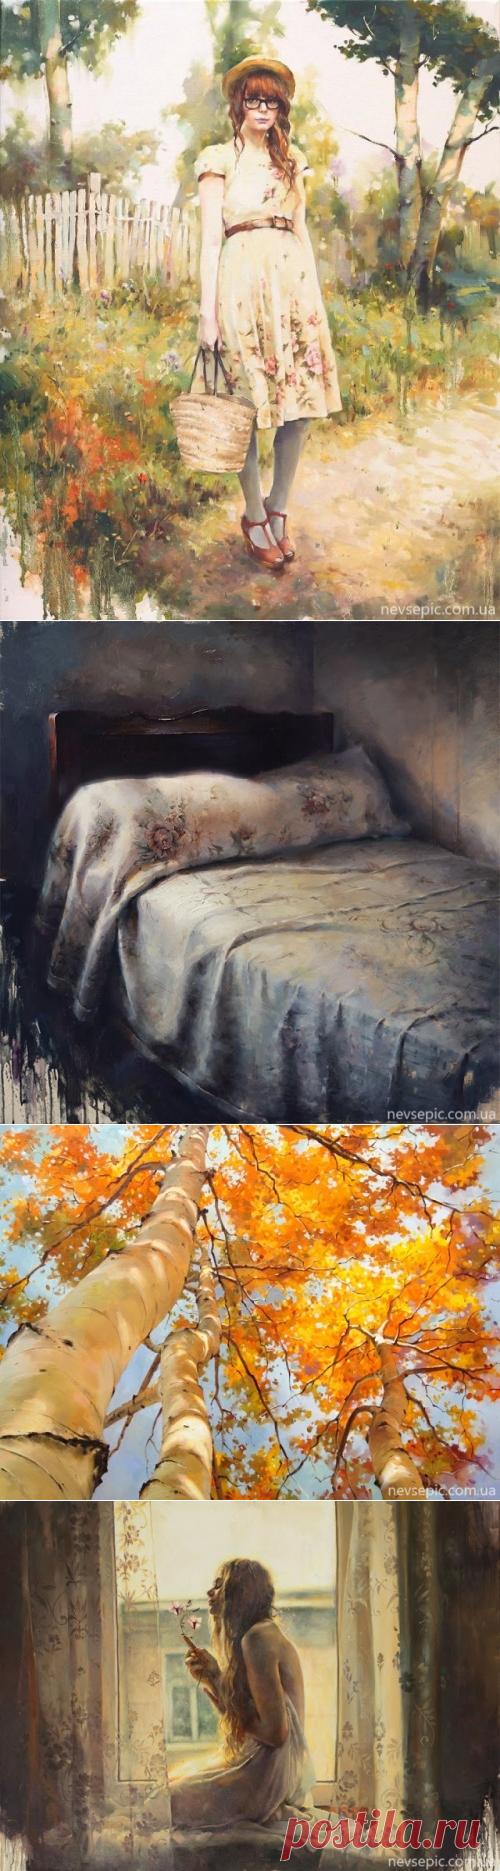 Ivan Alifan Jdanov (30 работ) » Картины, художники, фотографы на Nevsepic